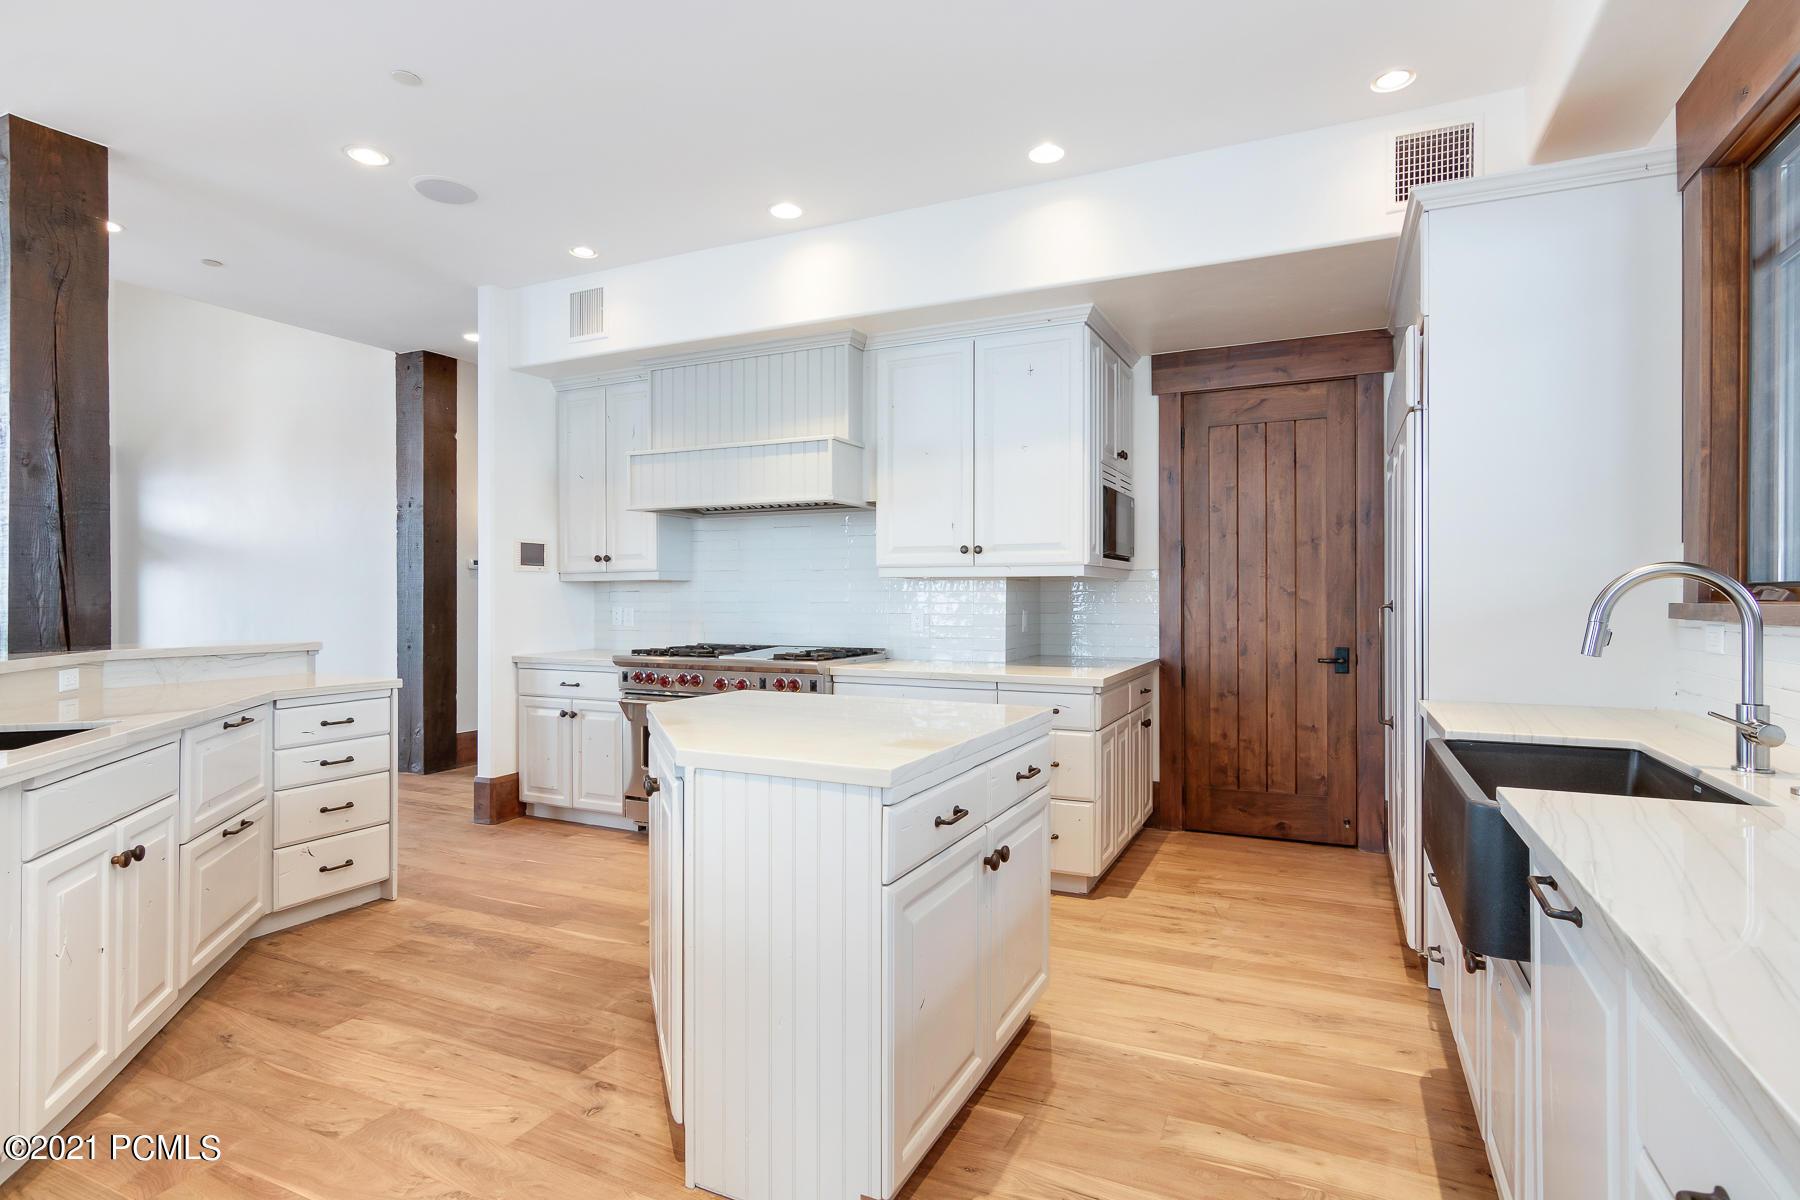 2681 Deer Hollow Road, Heber City, Utah 84032, 5 Bedrooms Bedrooms, ,7 BathroomsBathrooms,Single Family,For Sale,Deer Hollow,12100575